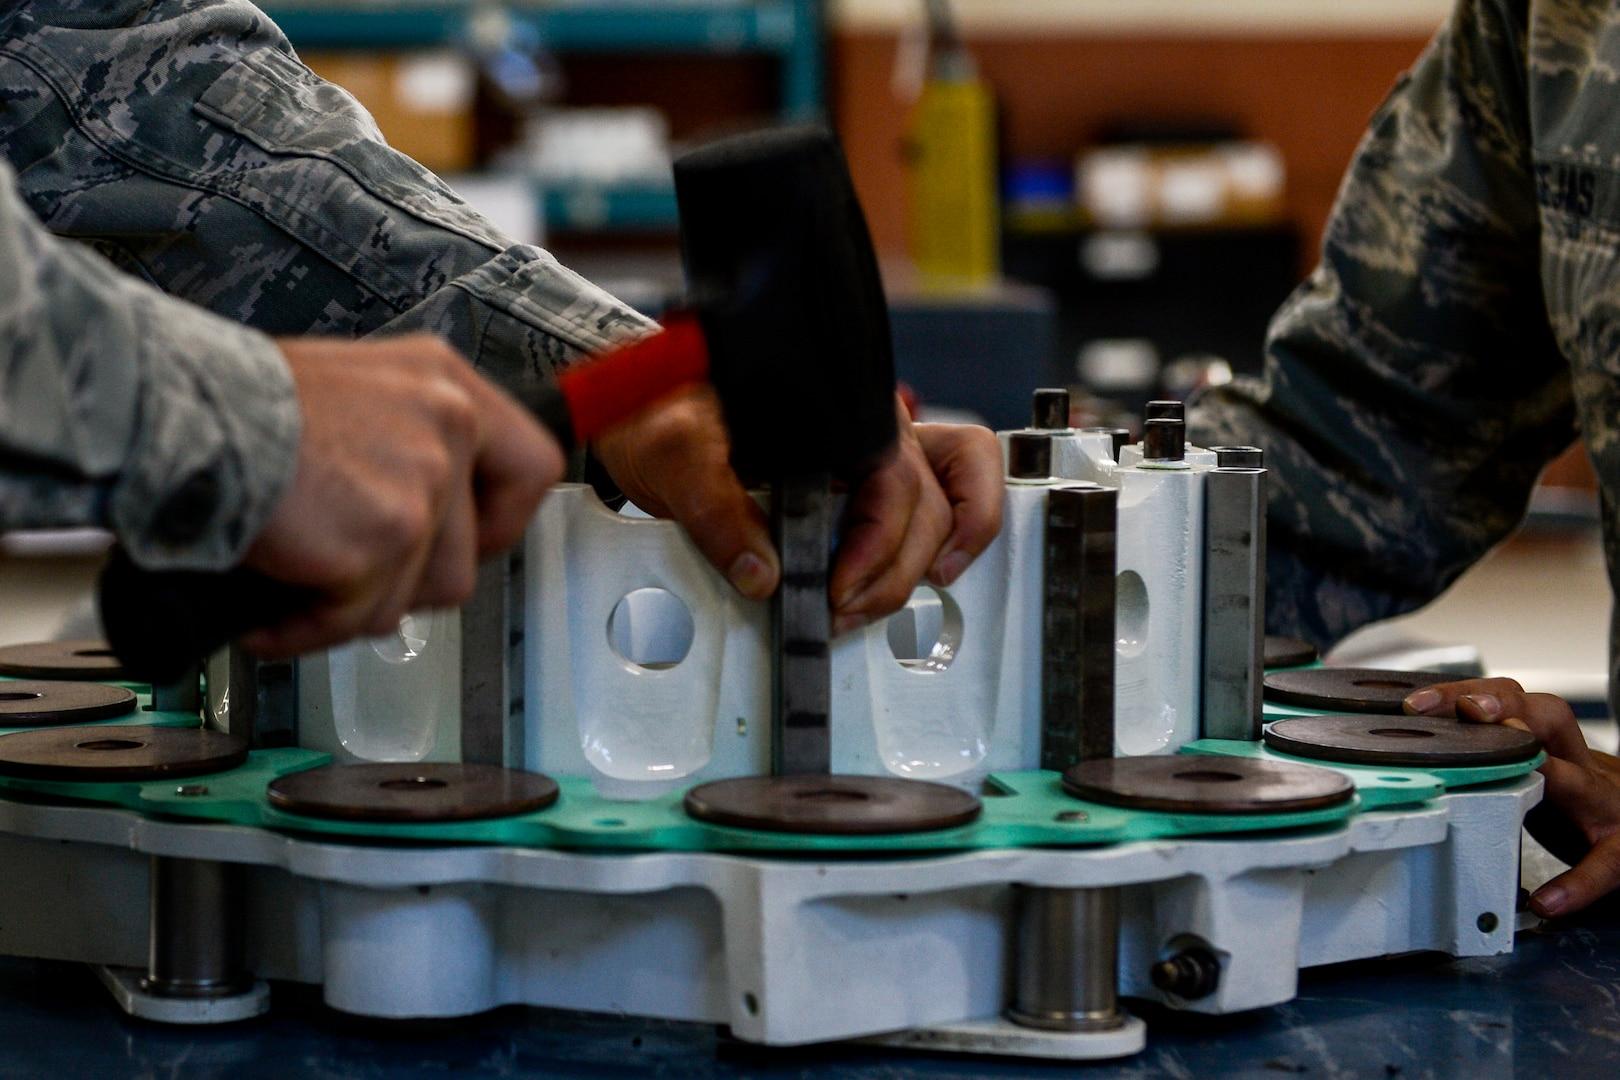 Repair facility saves nuclear command $13 million